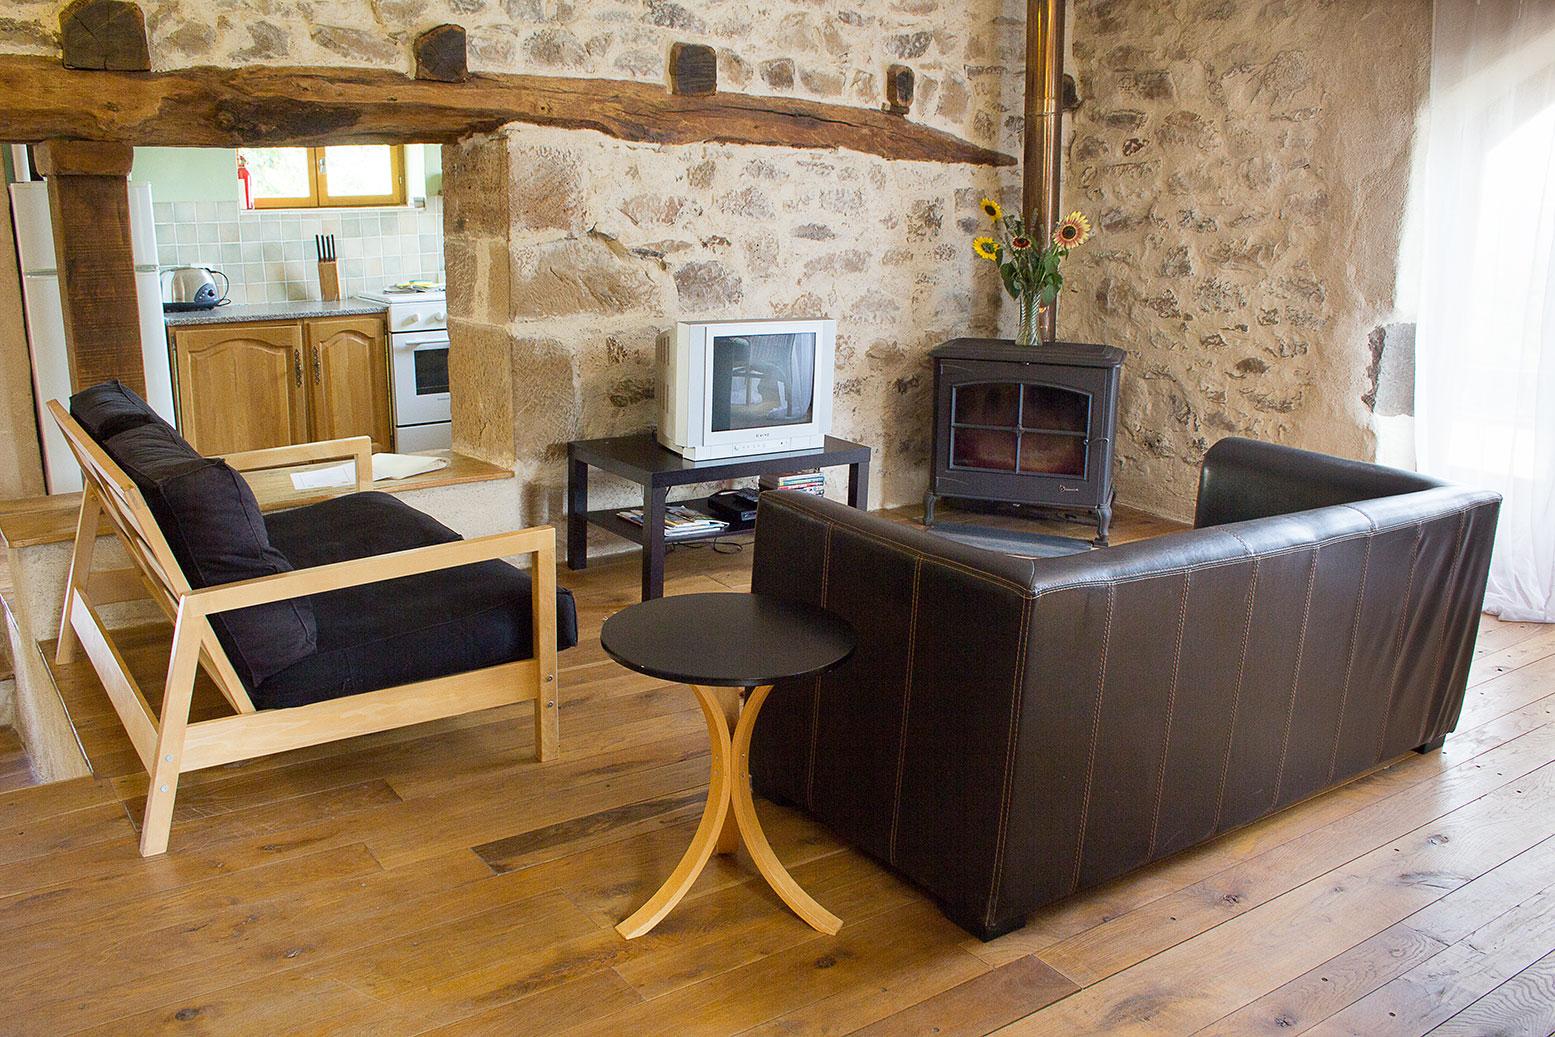 gîte livingroom